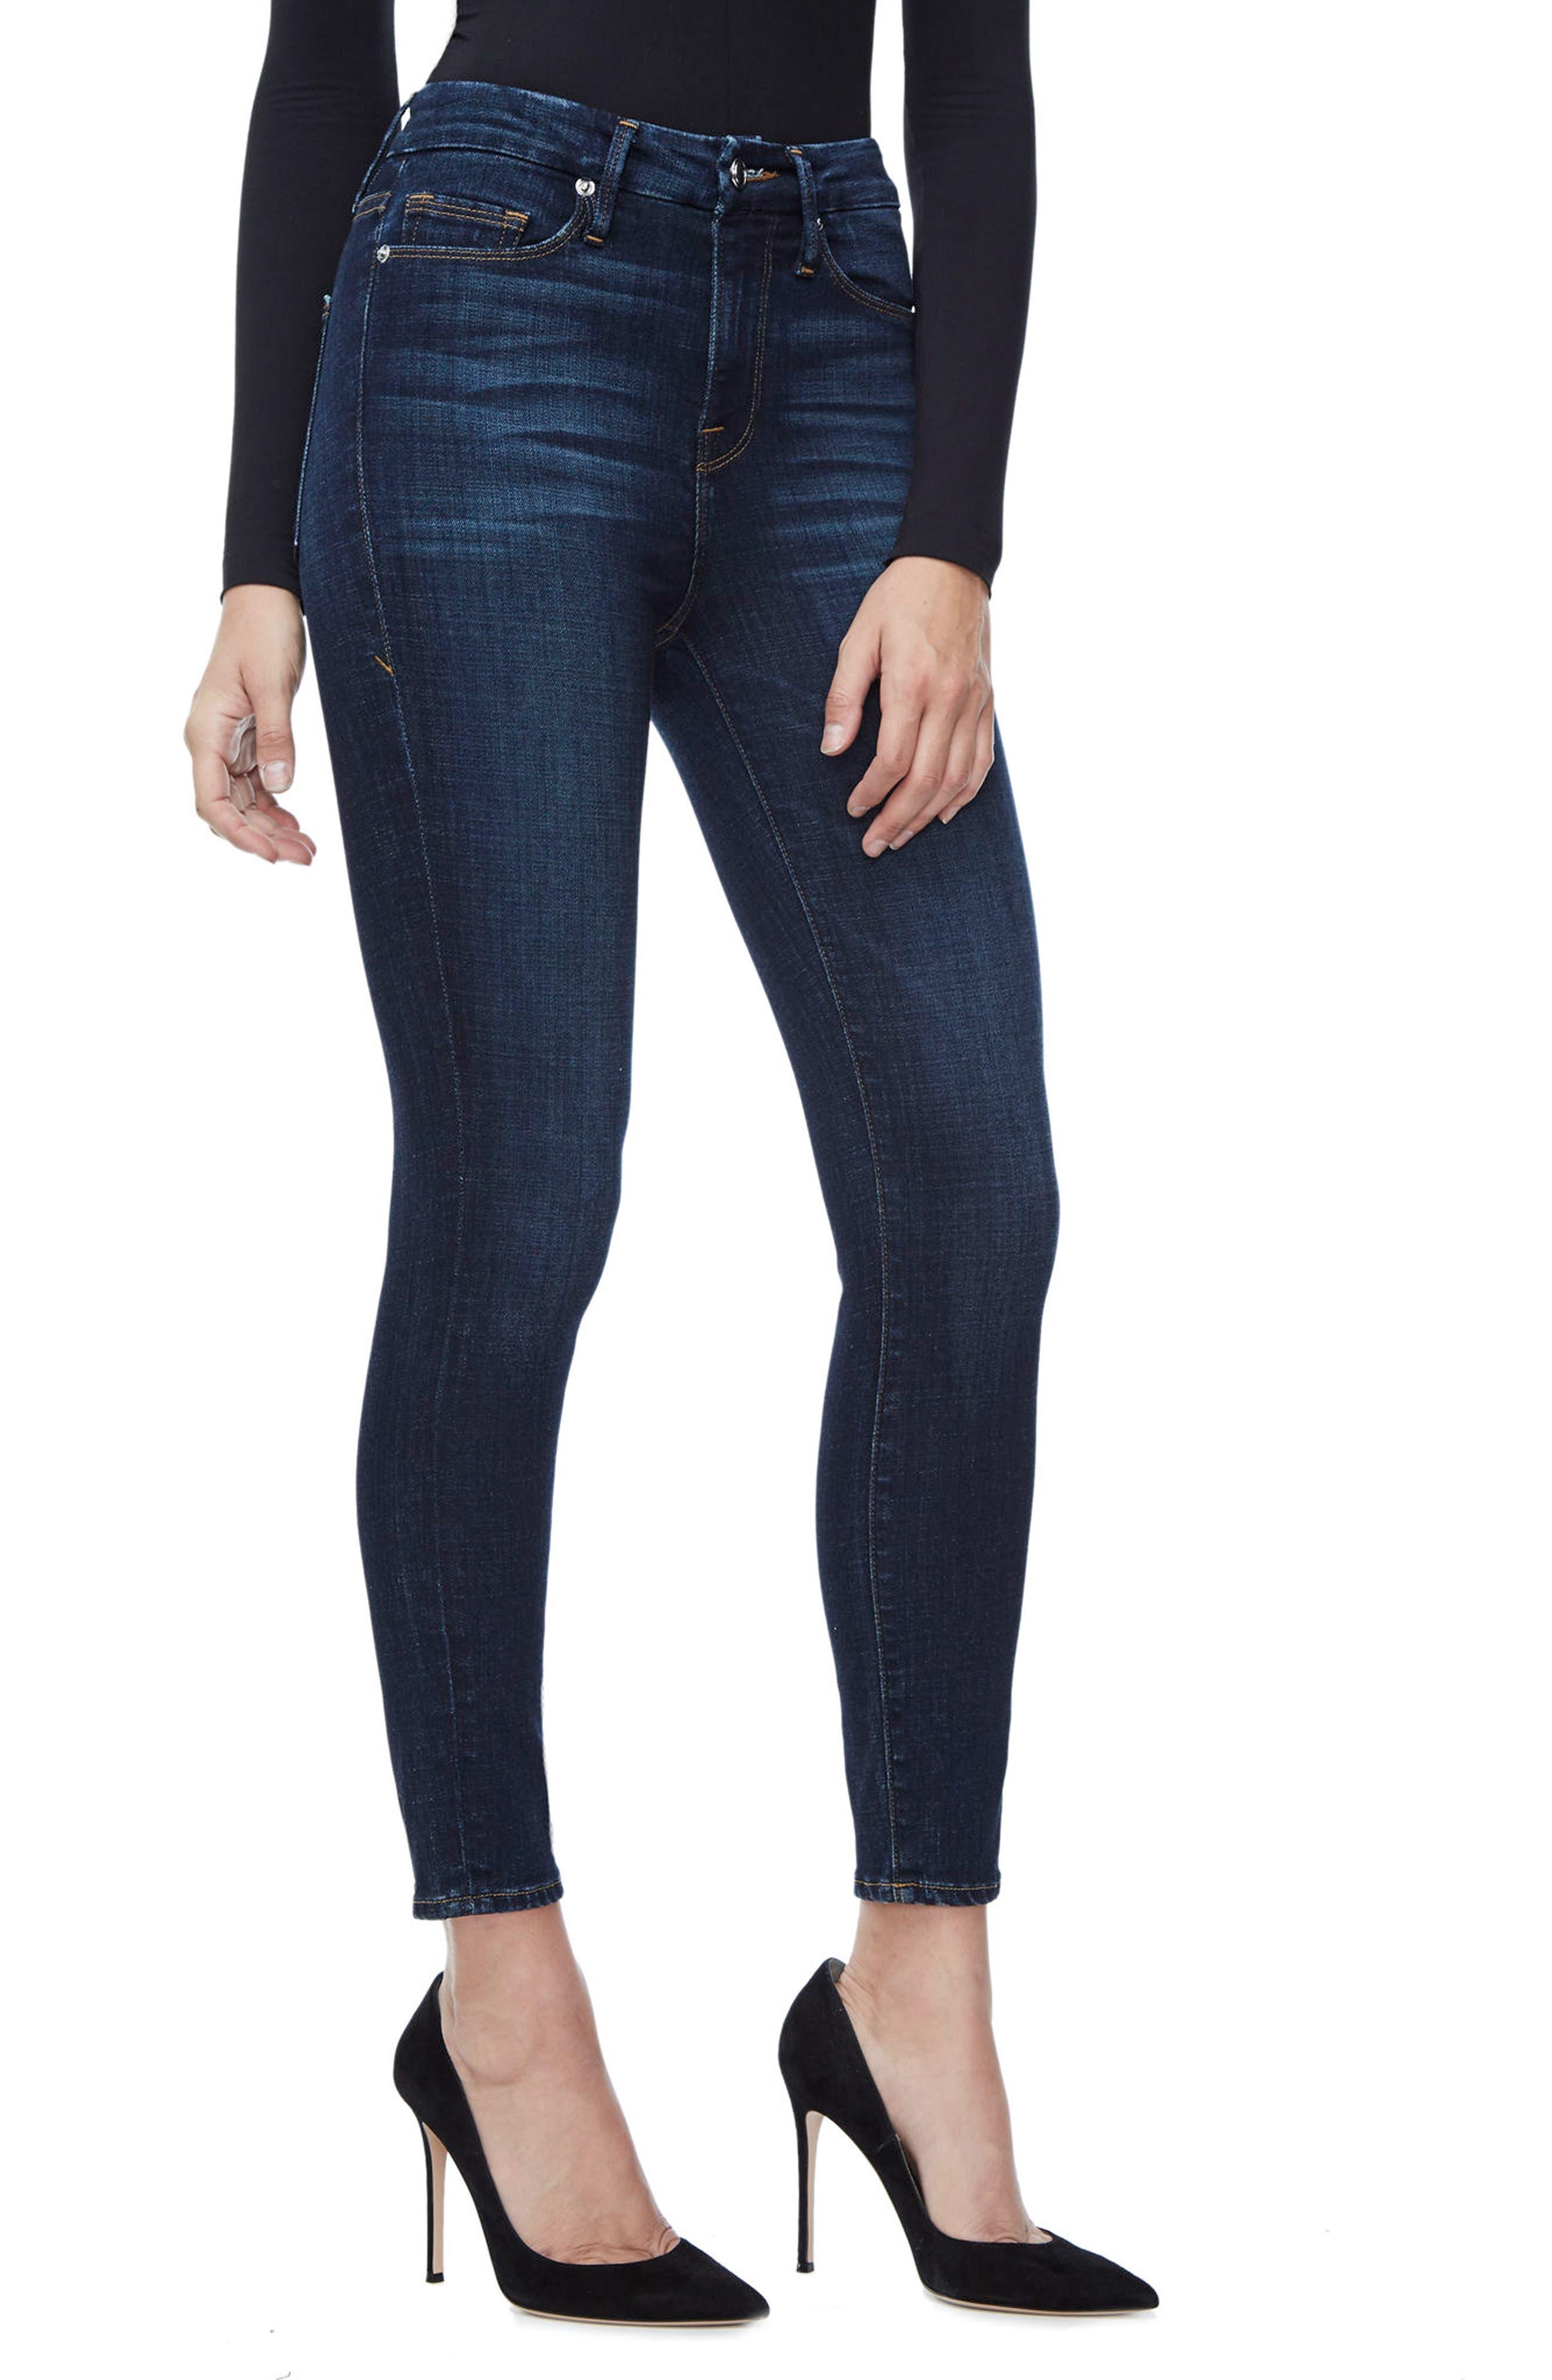 Alternate Image 3  - Good American Good Legs High Waist Ankle Skinny Jeans (Blue 089) (Regular & Plus Size)